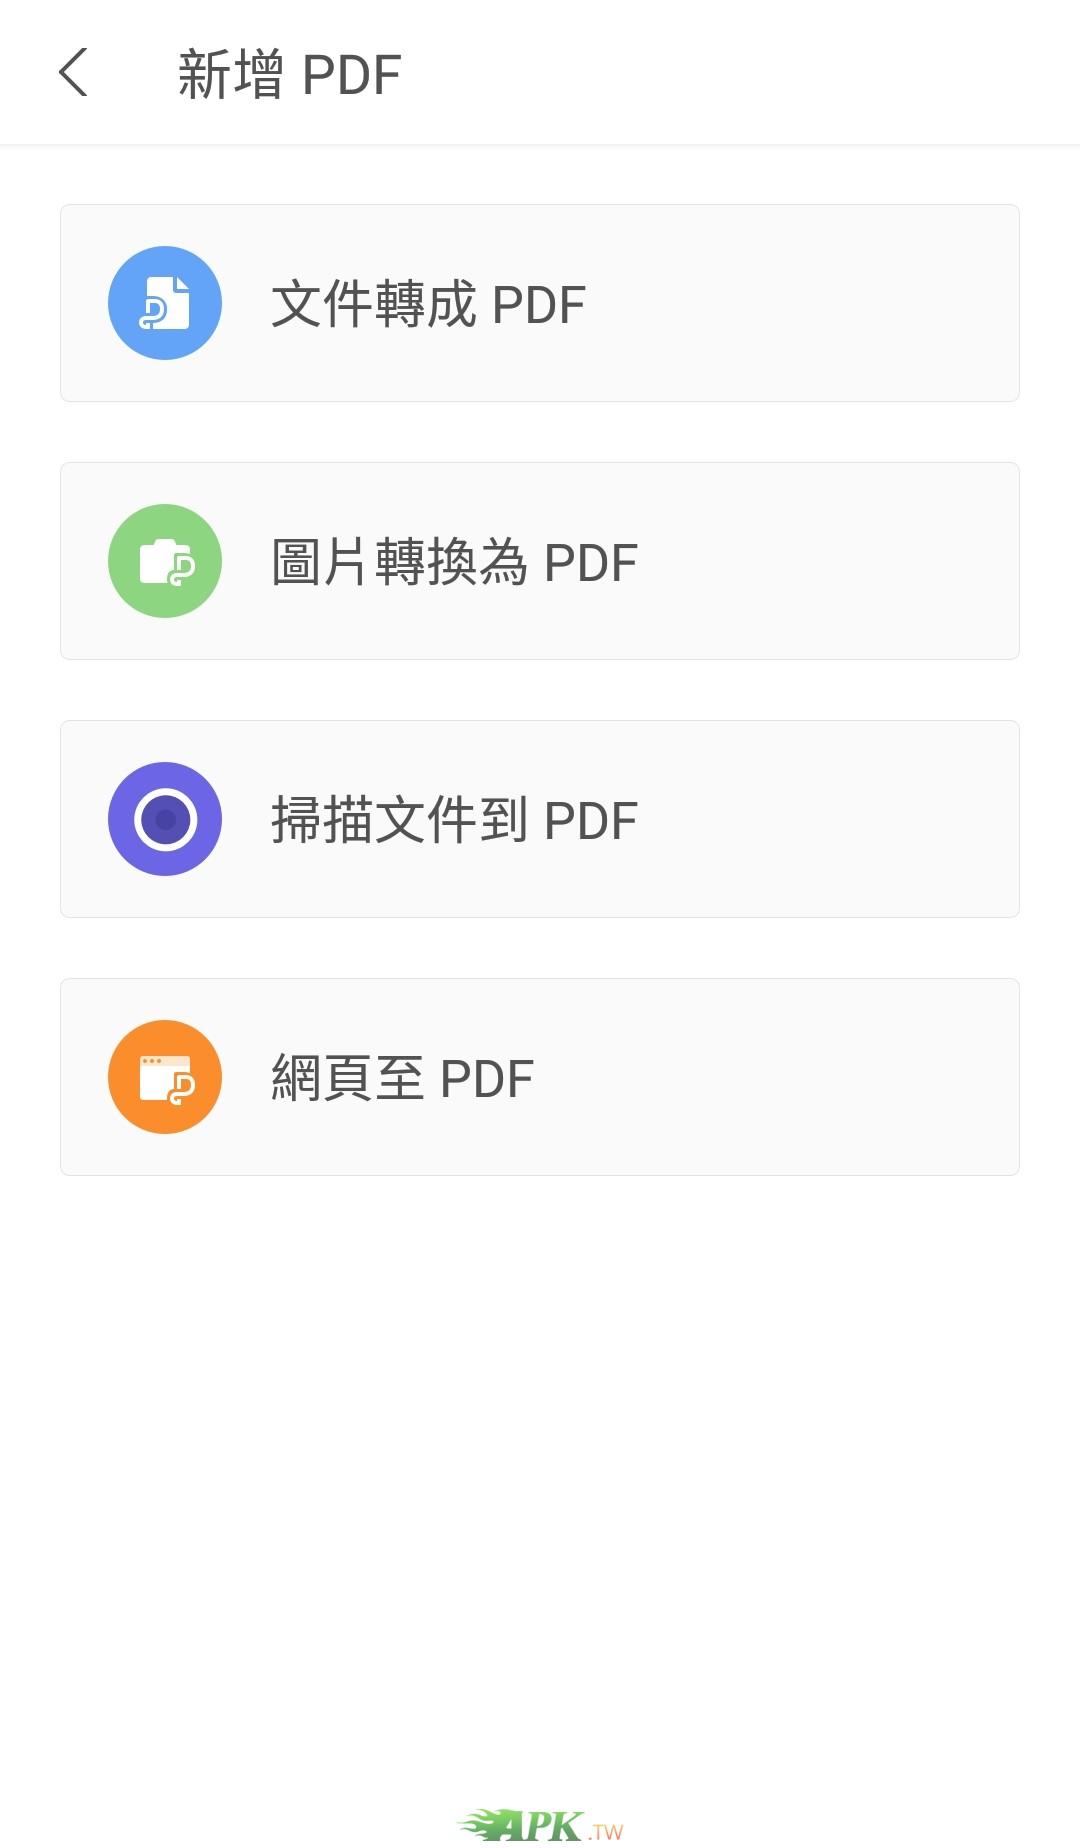 WPSOffice__2.jpg